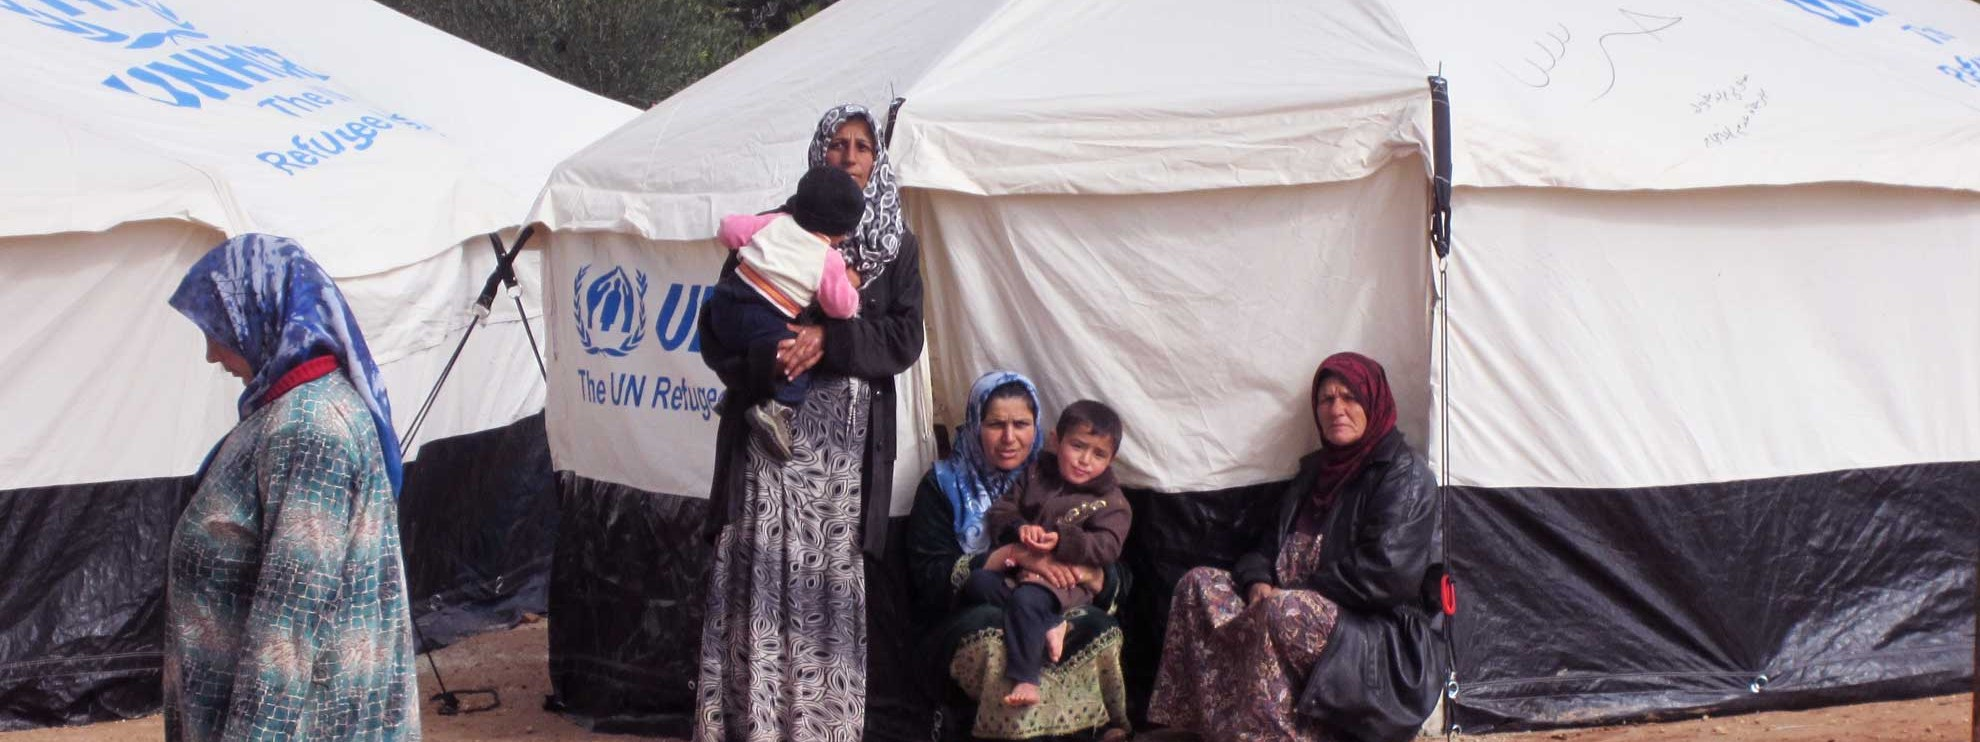 Camps de réfugiés en Syrie, février 2013. © Amnesty International